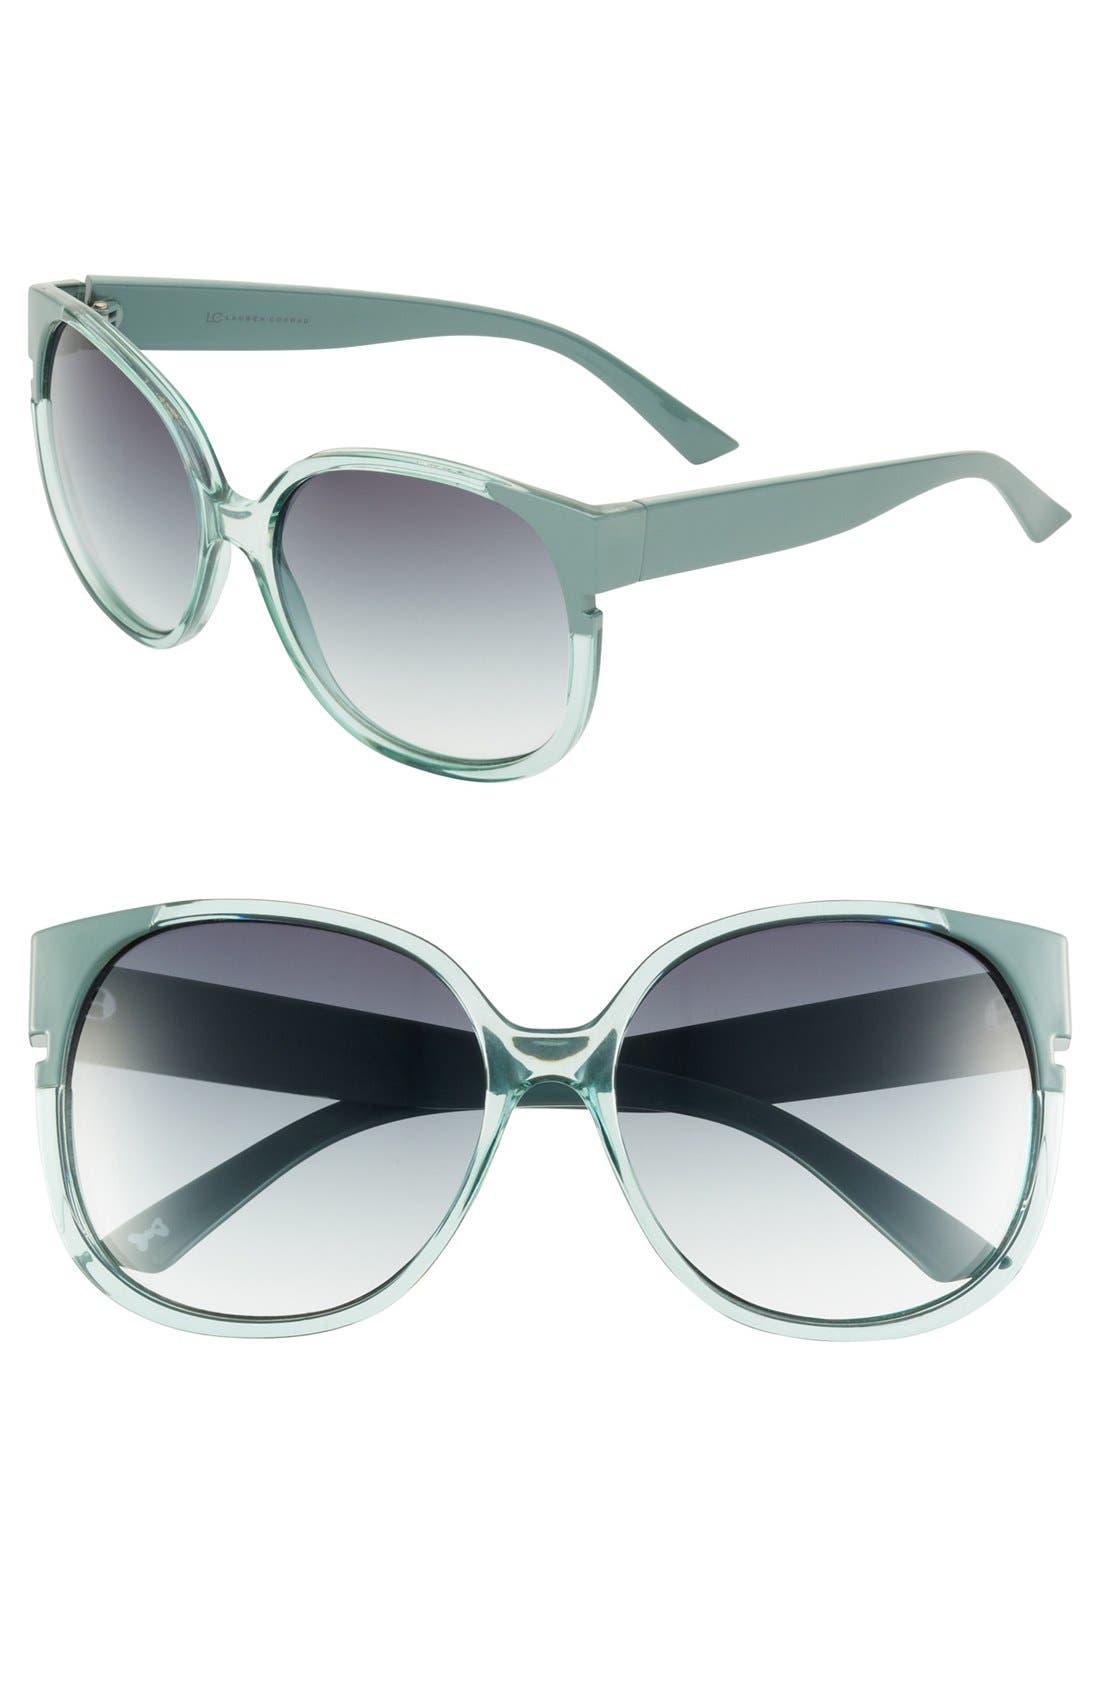 Main Image - Outlook Eyewear 'Corona del Mar' 59mm Sunglasses